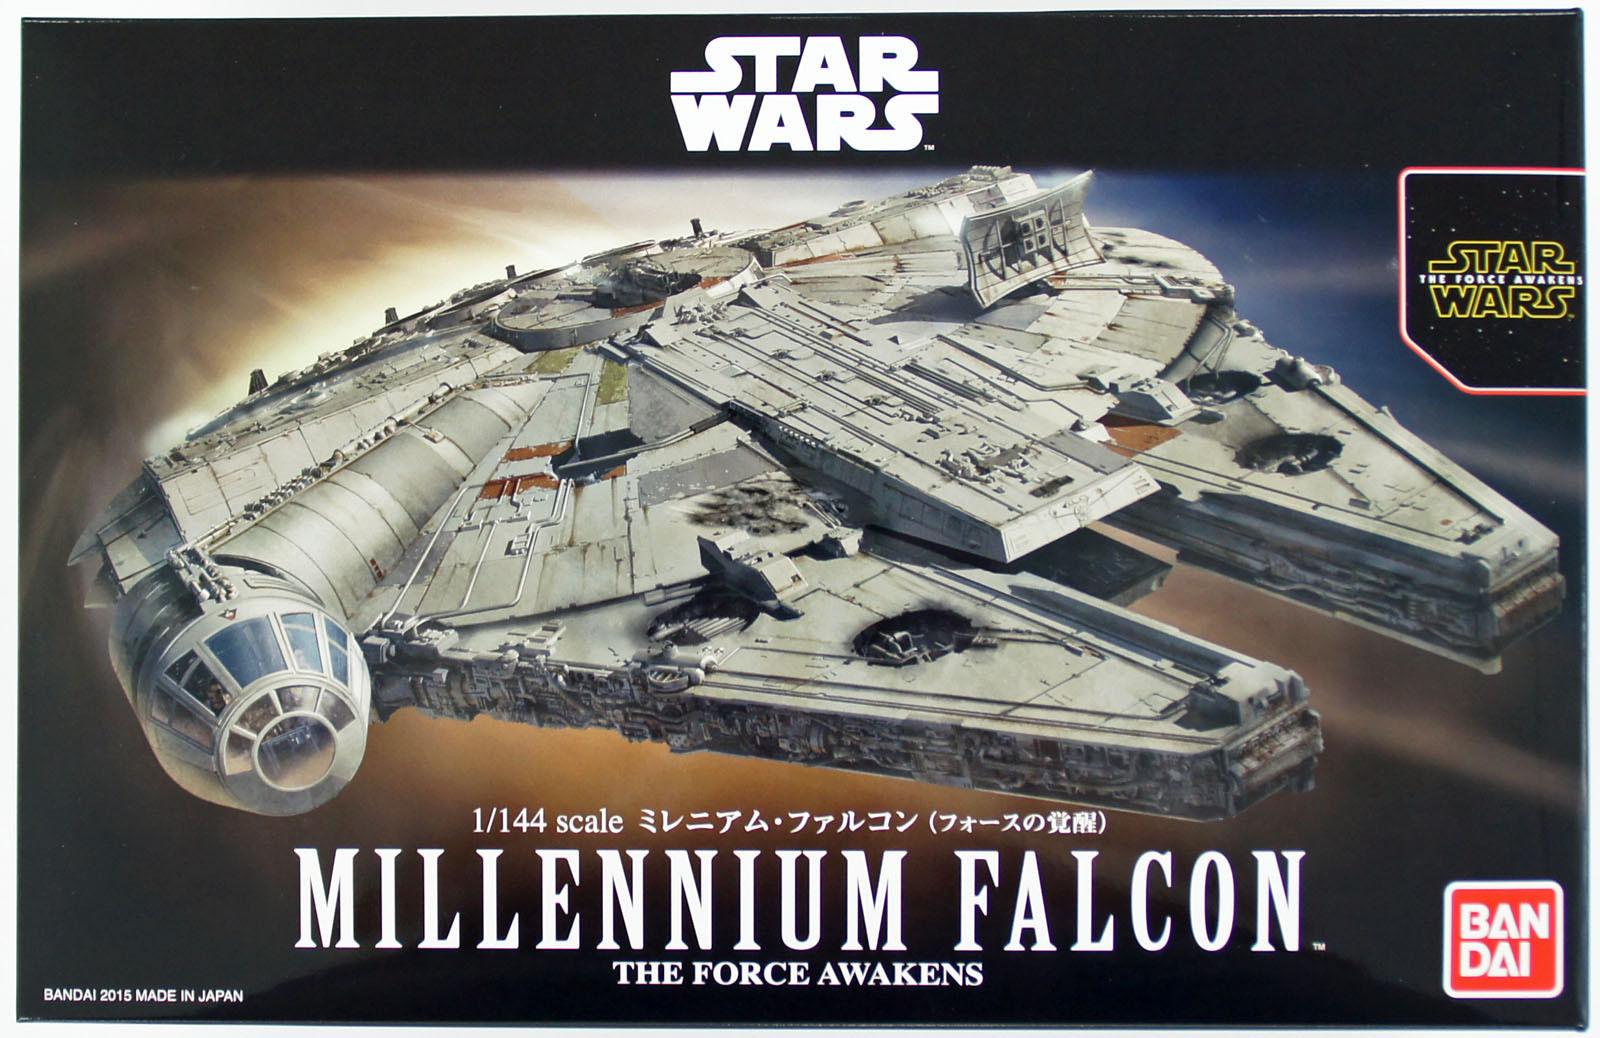 Star Wars Millennium Falcon 1:144 scale kit by BANDAI